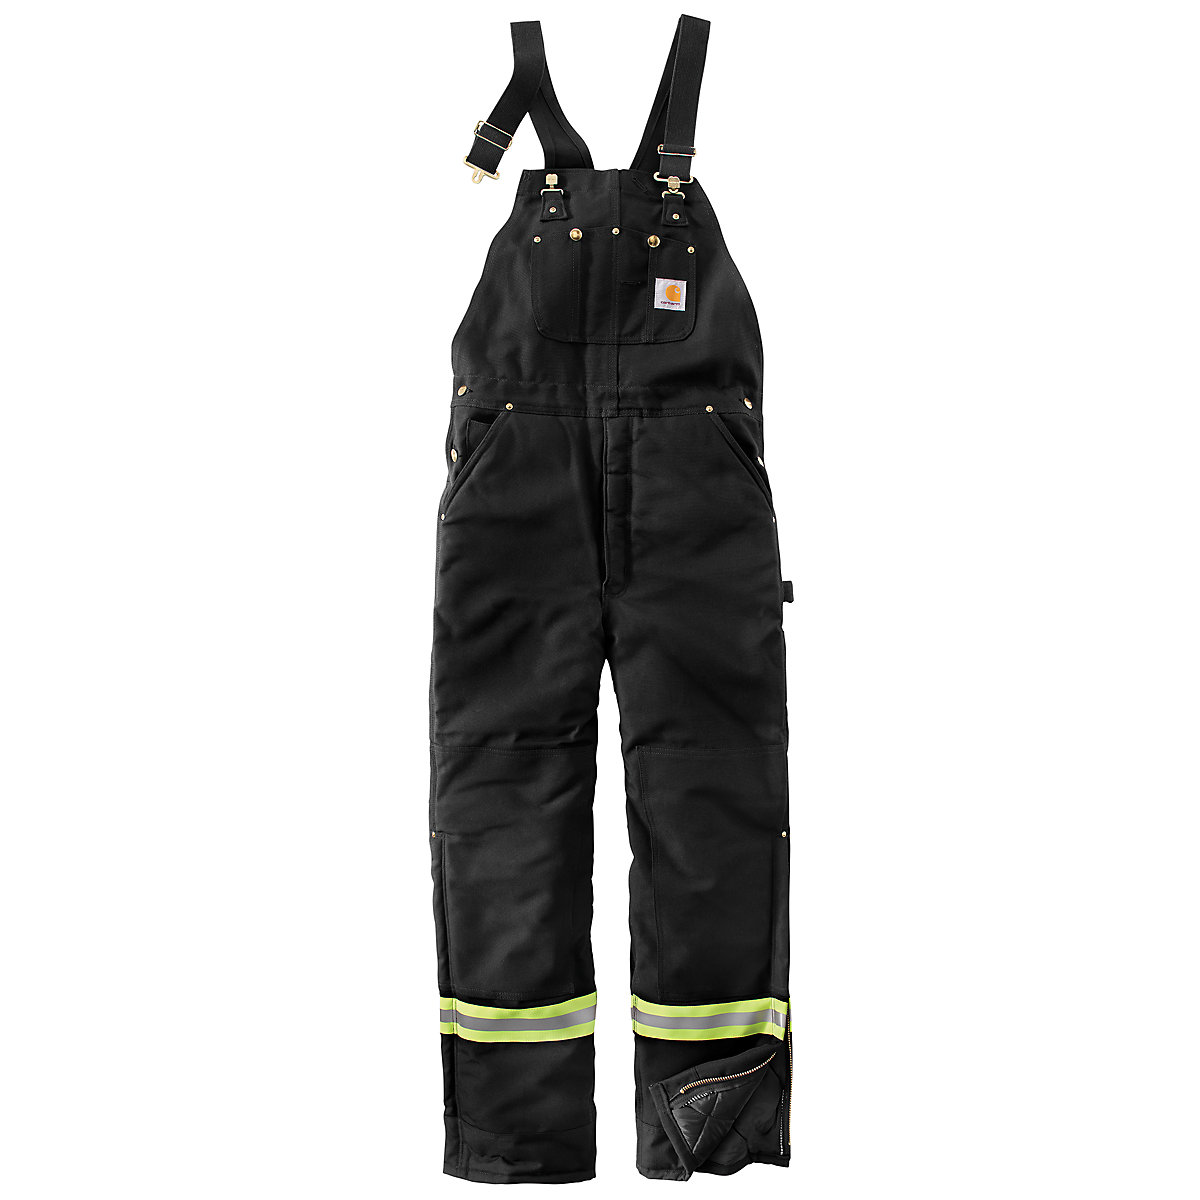 Men's High-Visibility Striped Duck Bib Lined Overall/Arctic Quilt ... : carhartt quilt lined duck bib overalls - Adamdwight.com